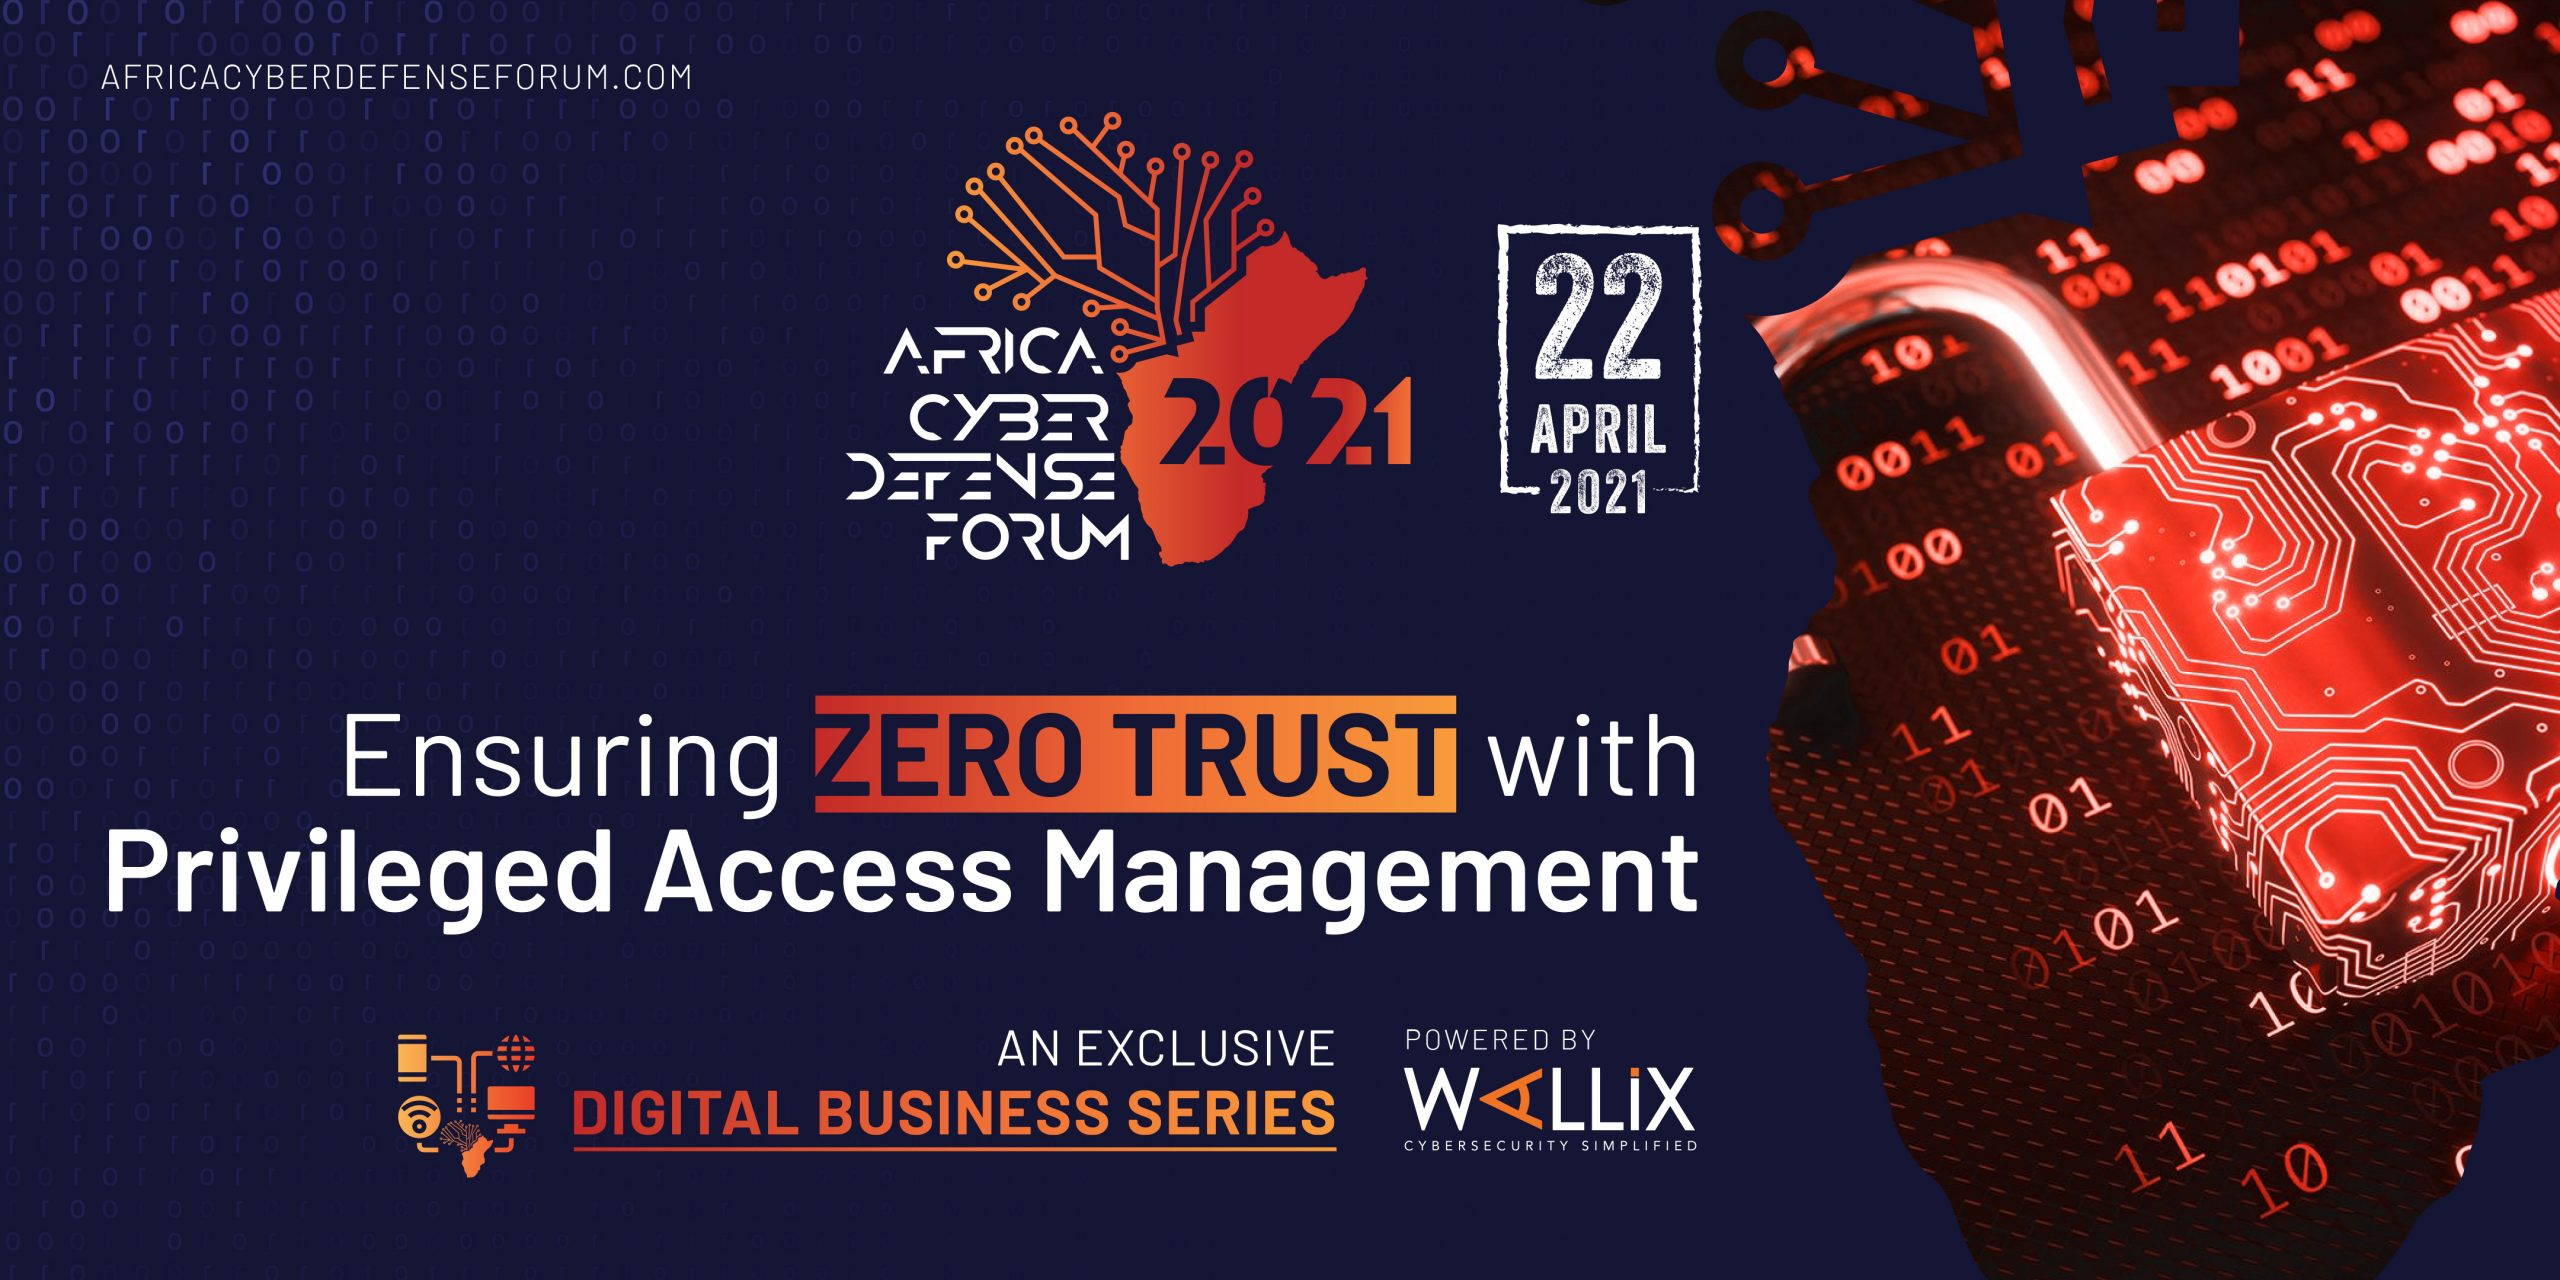 Ensuring Zero Trust with Privileged Access Management